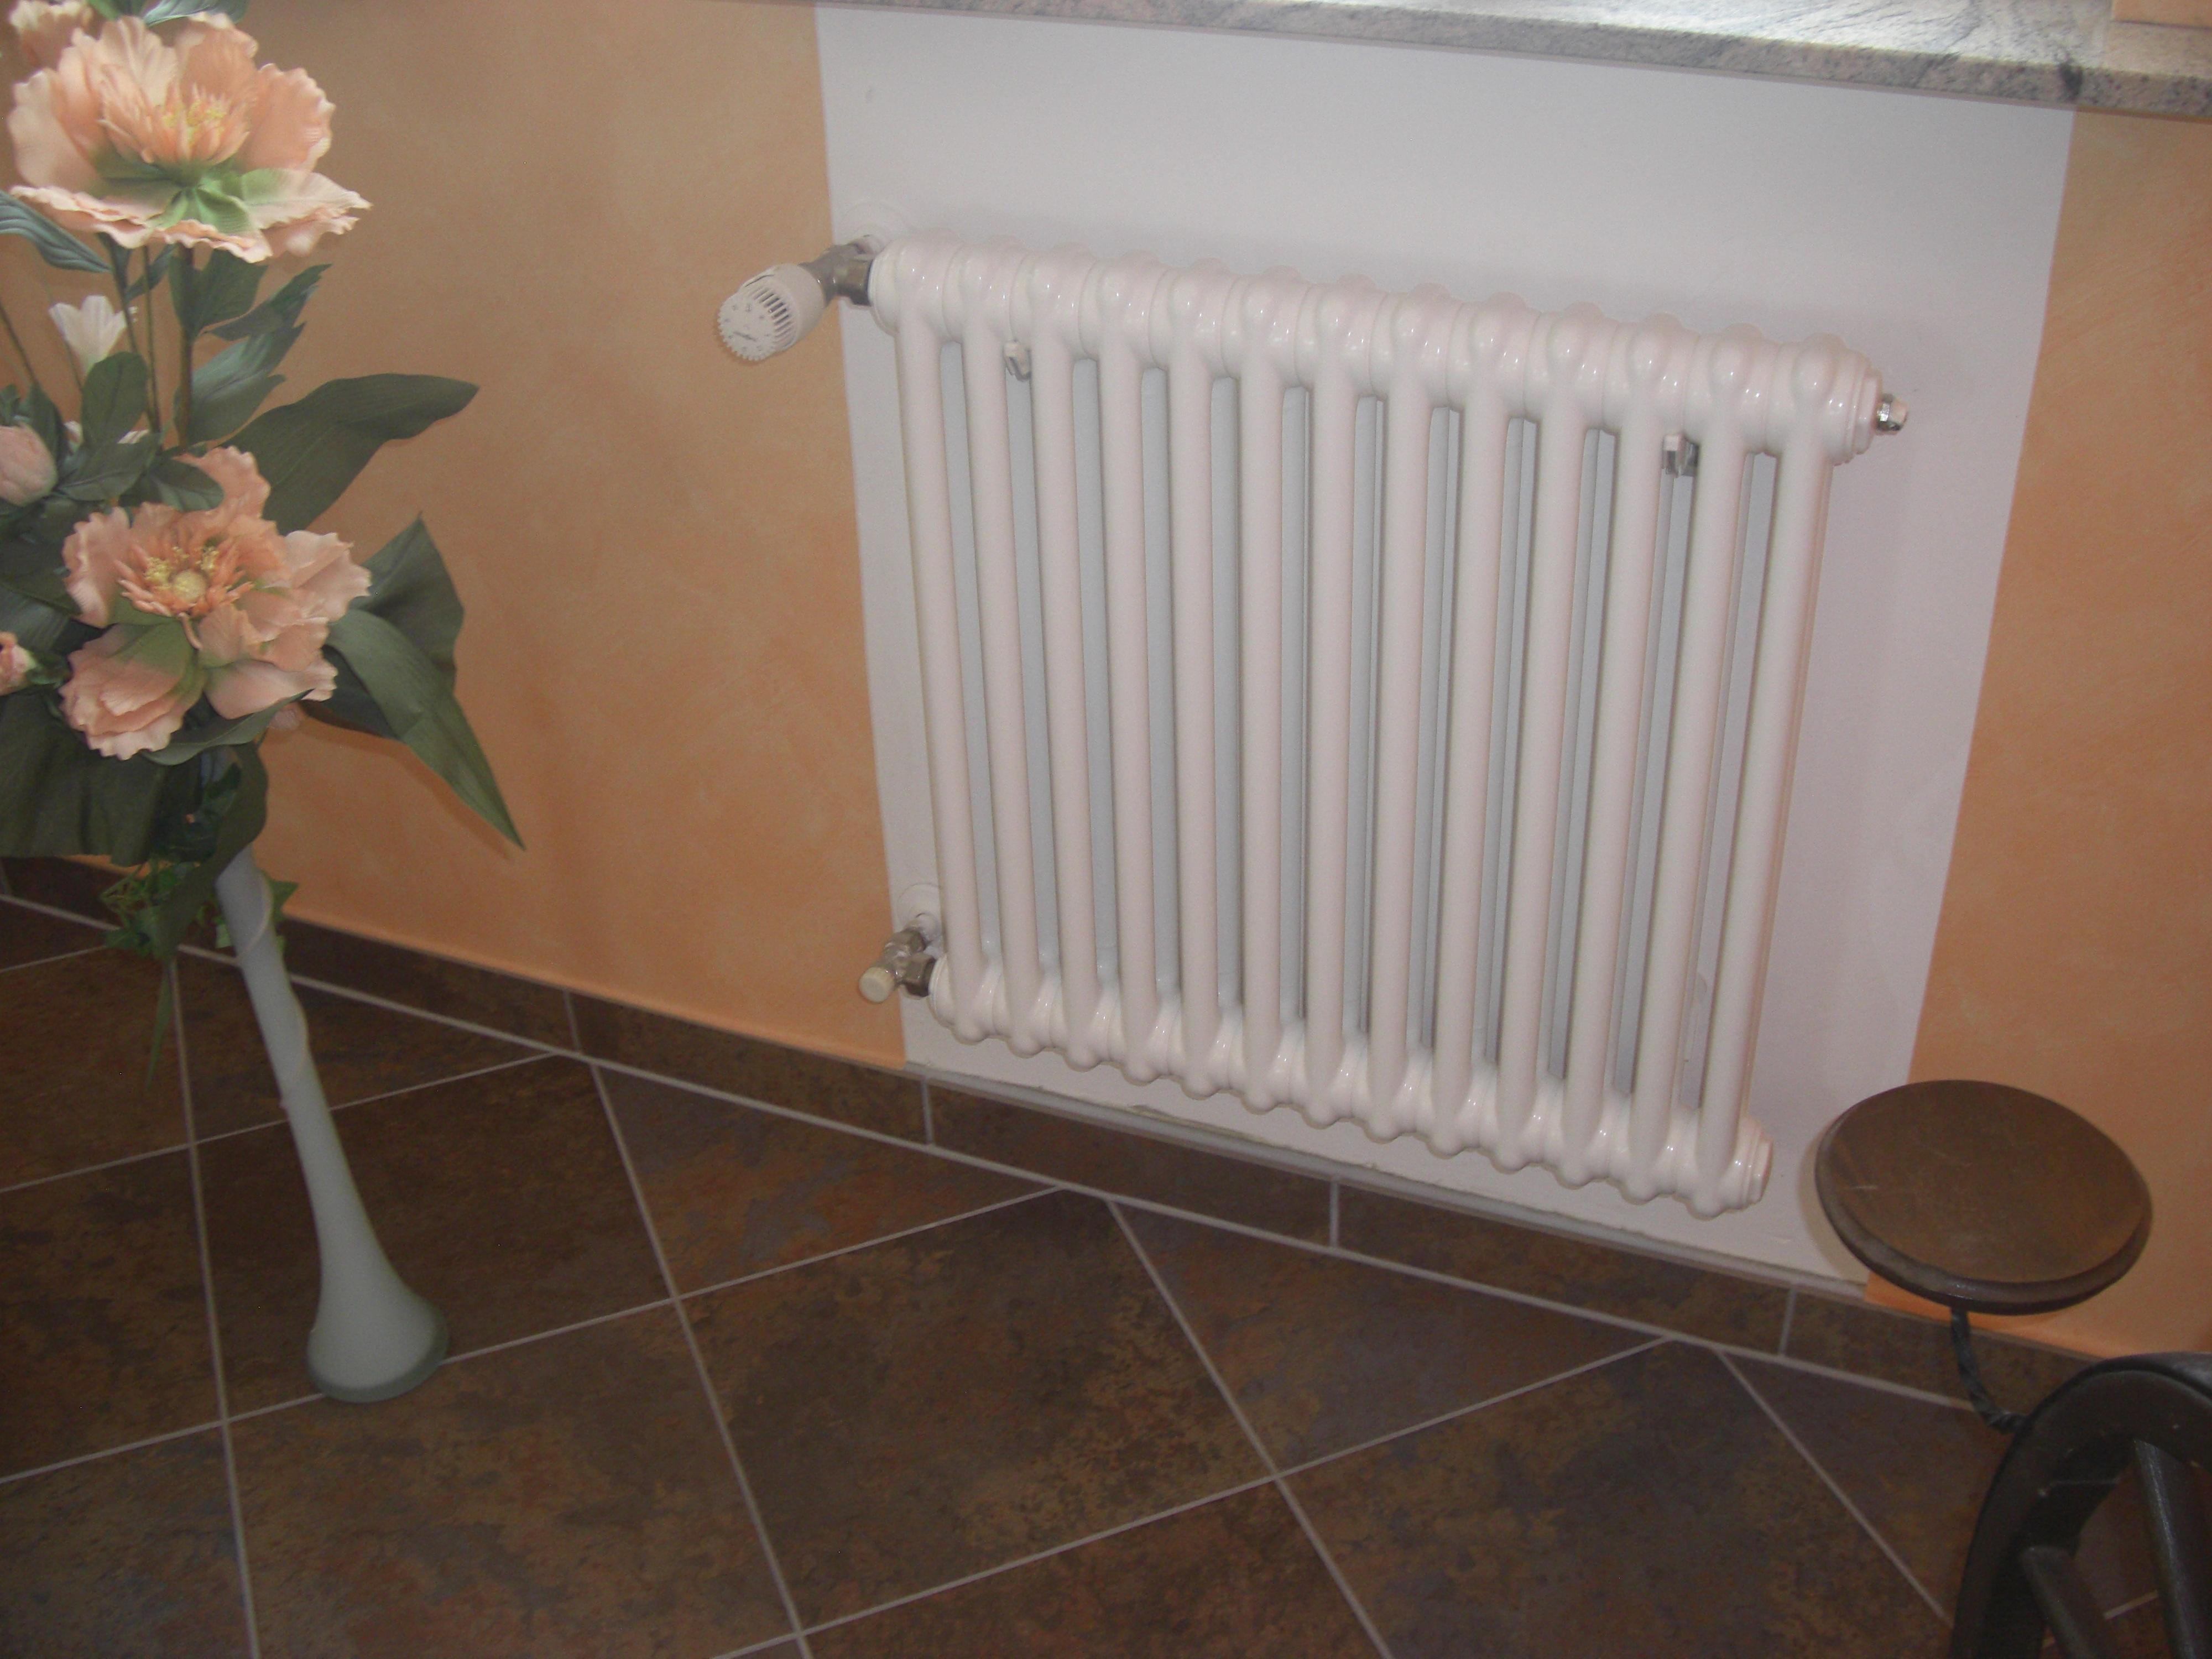 arbonia bagnotherm bt 150 klimaanlage und heizung. Black Bedroom Furniture Sets. Home Design Ideas